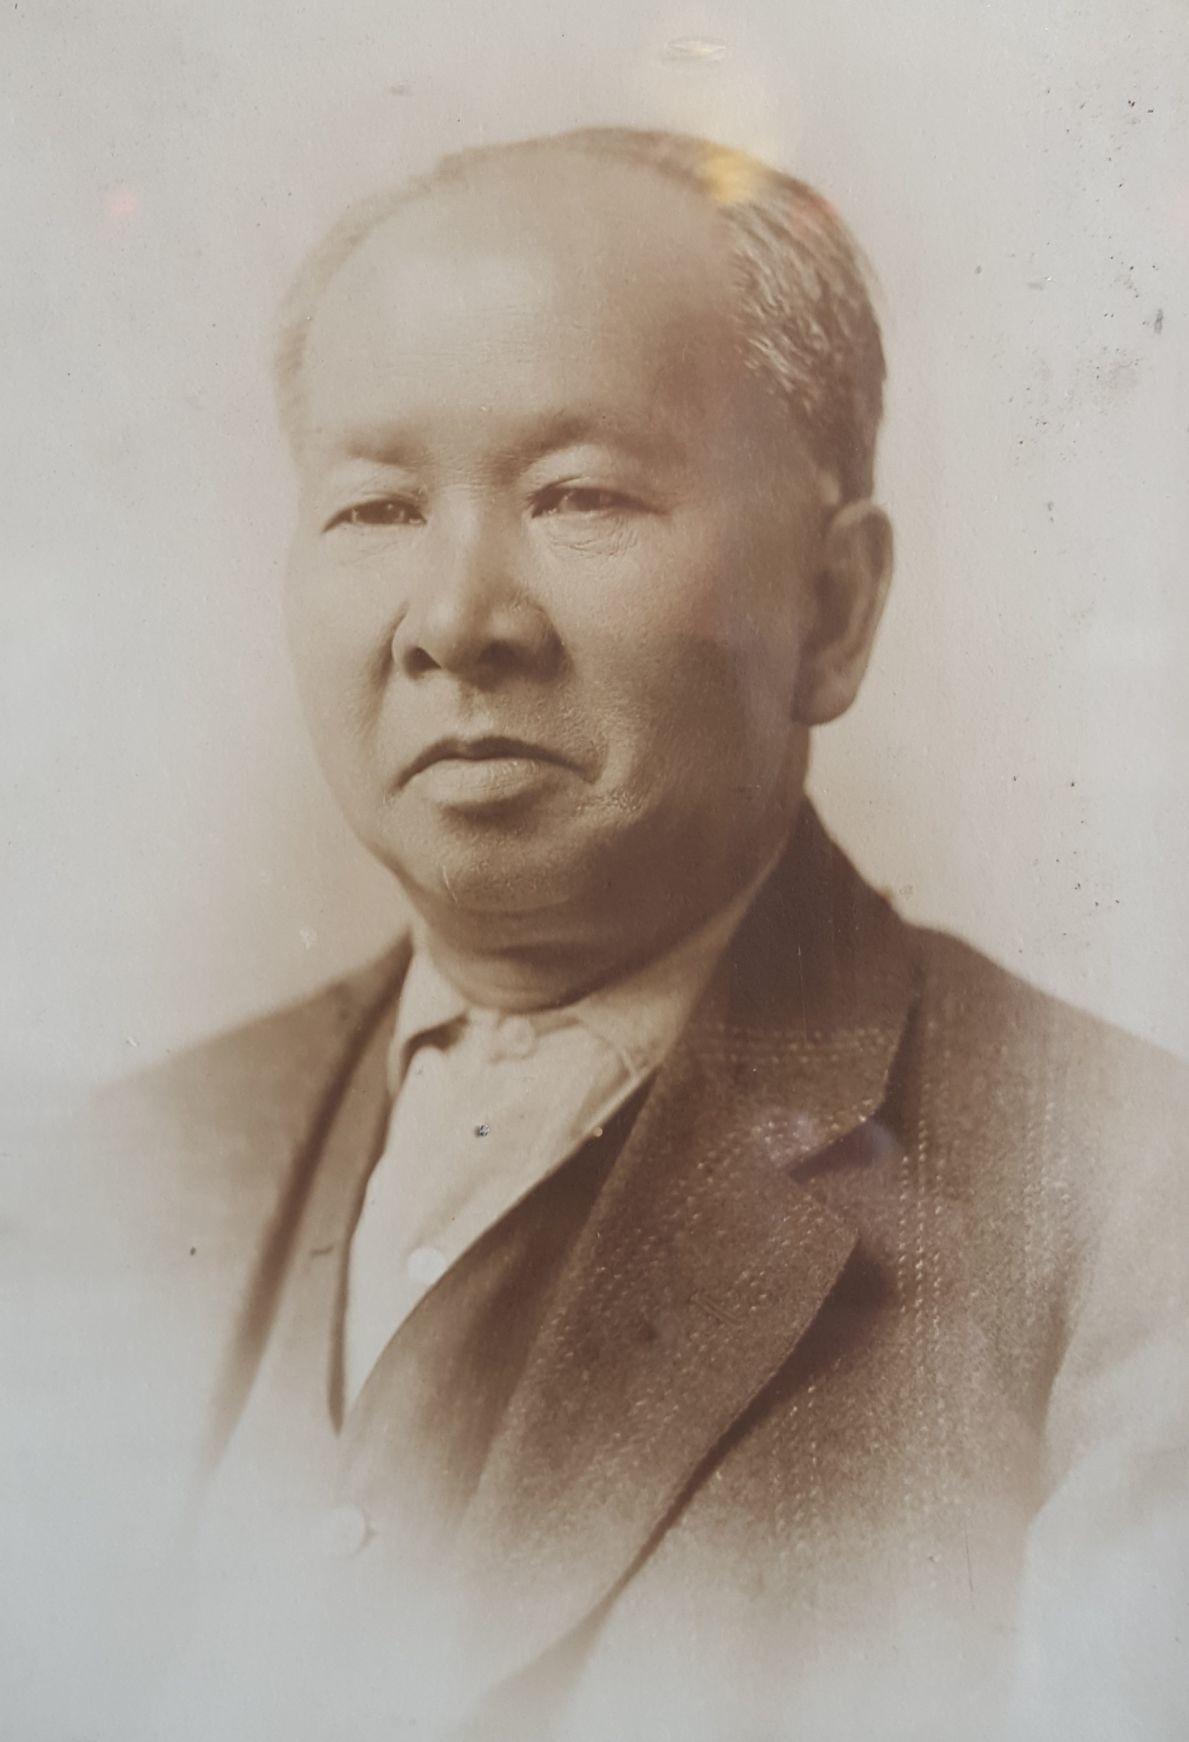 Photo: Chin Chun Hock photo in Mai Wah Museum.